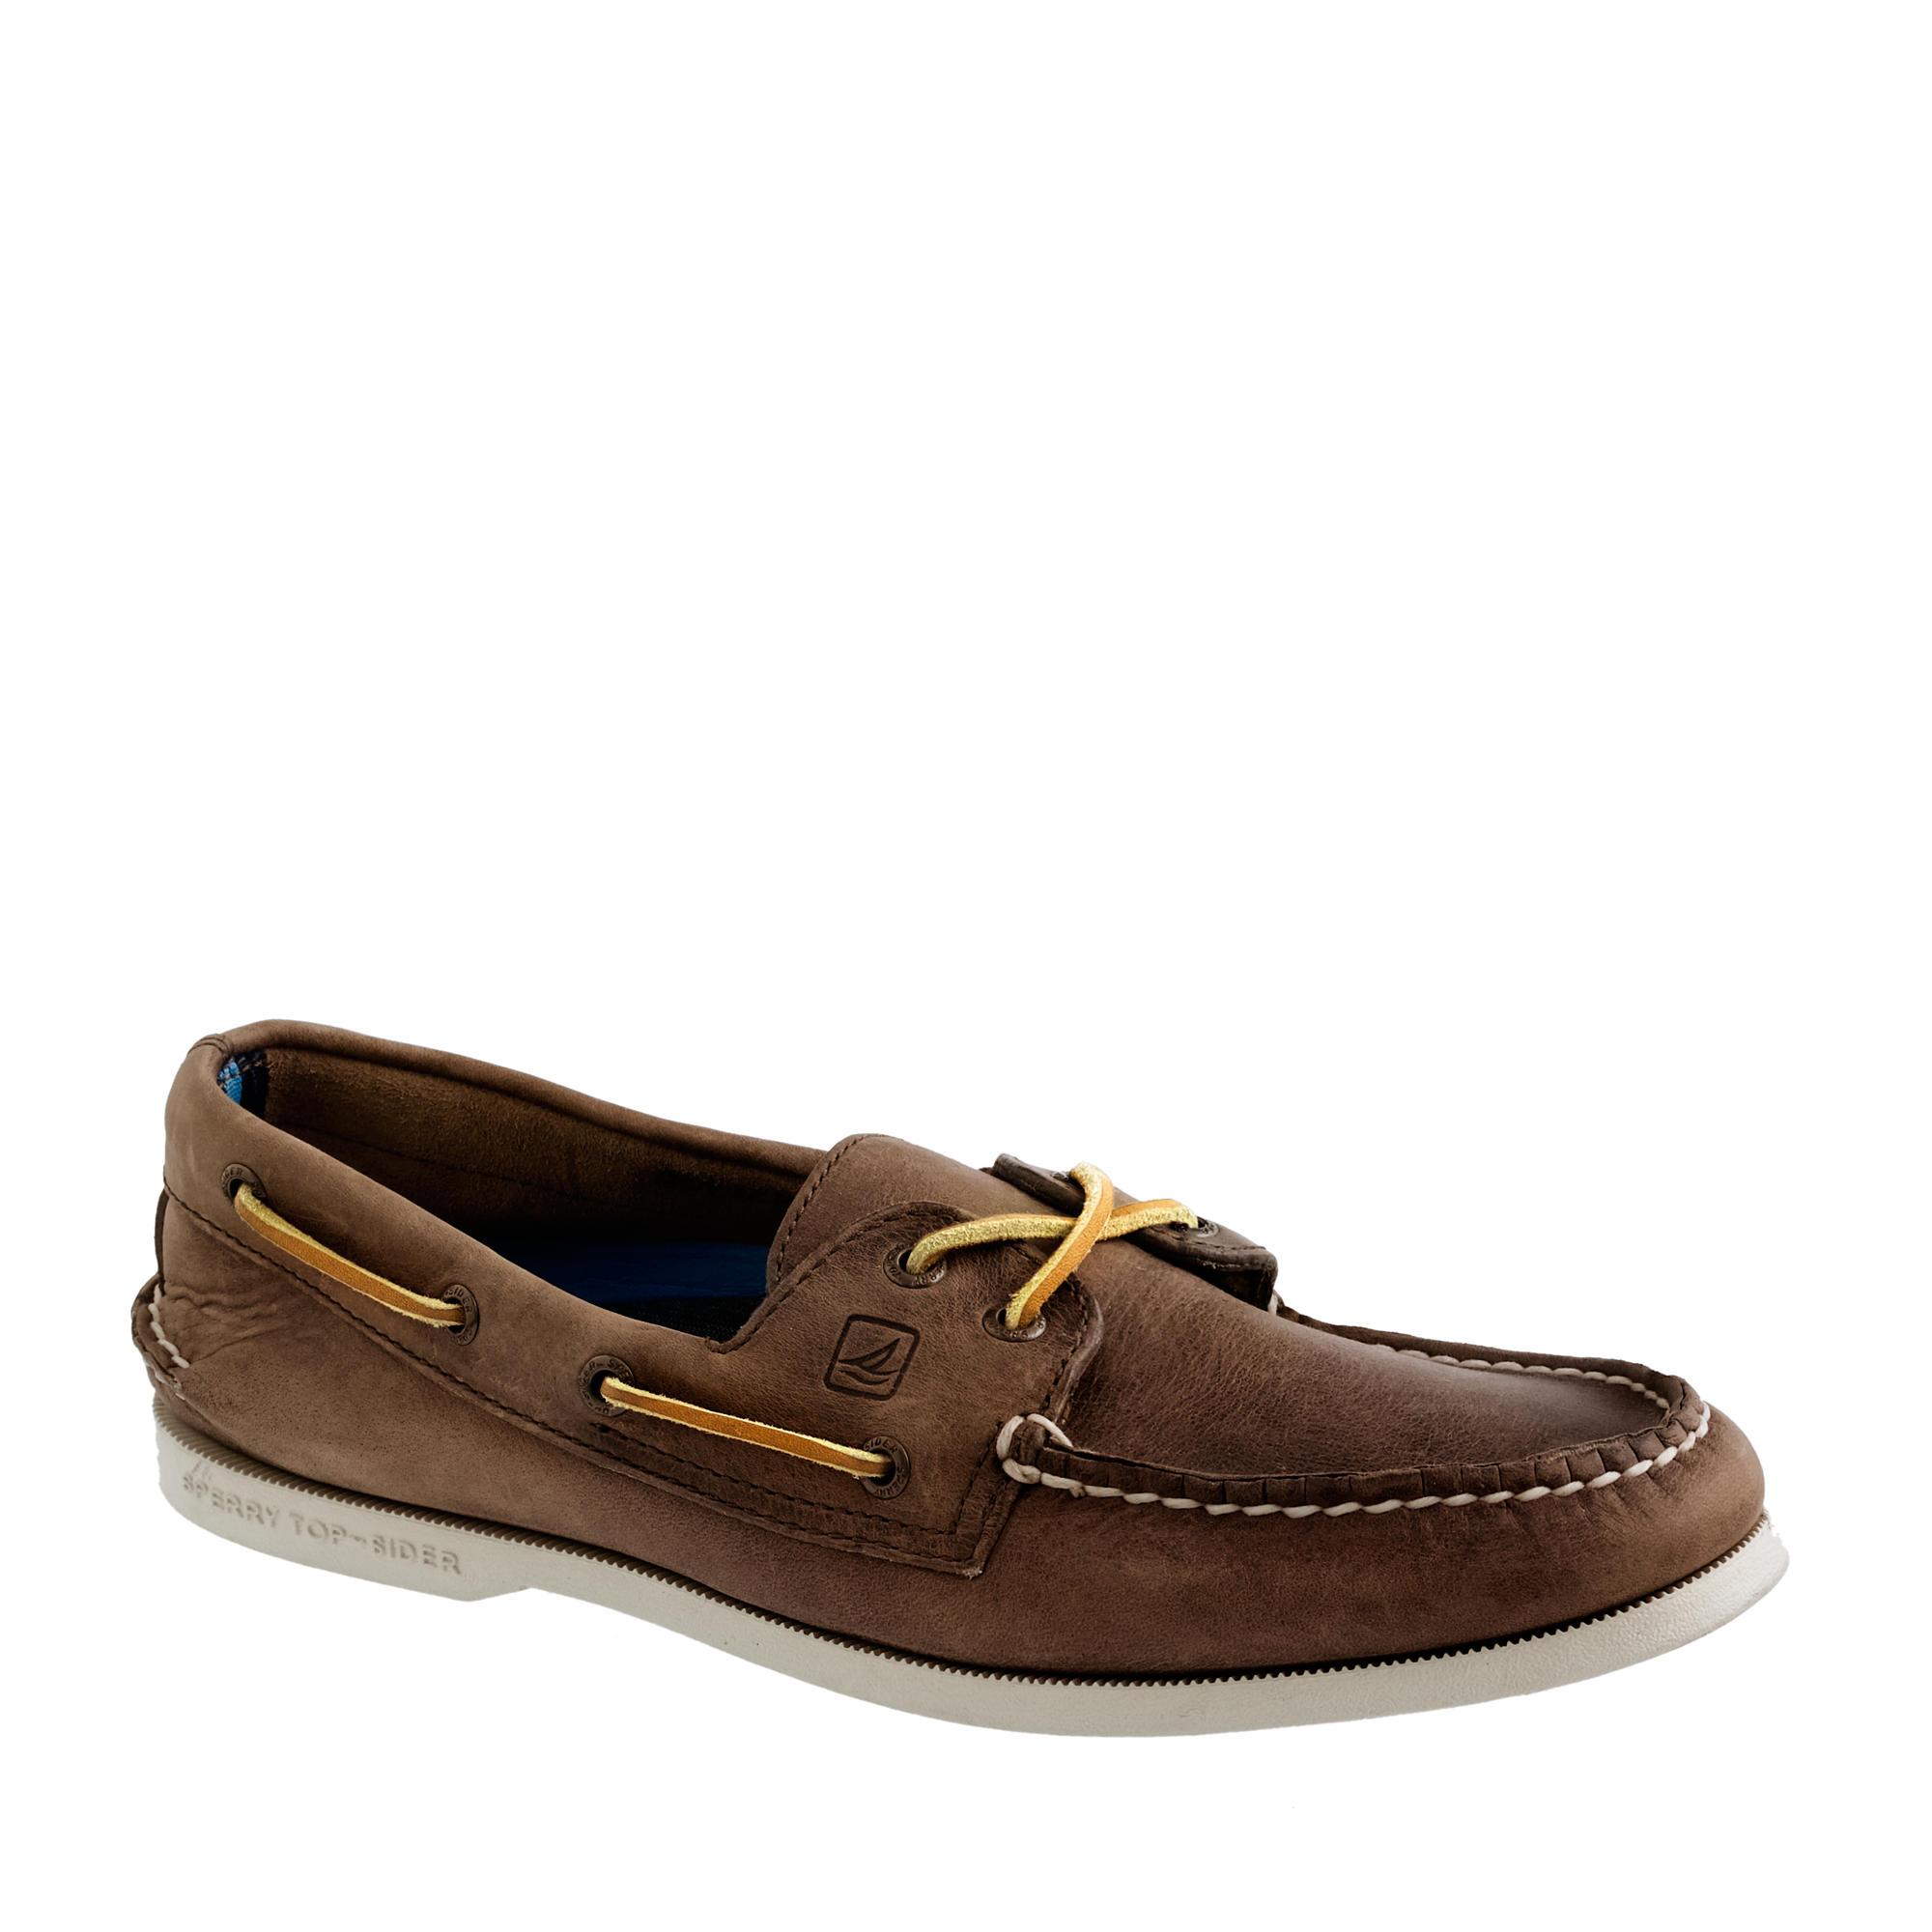 Sperry Dark Brown Boat Shoes Uk London